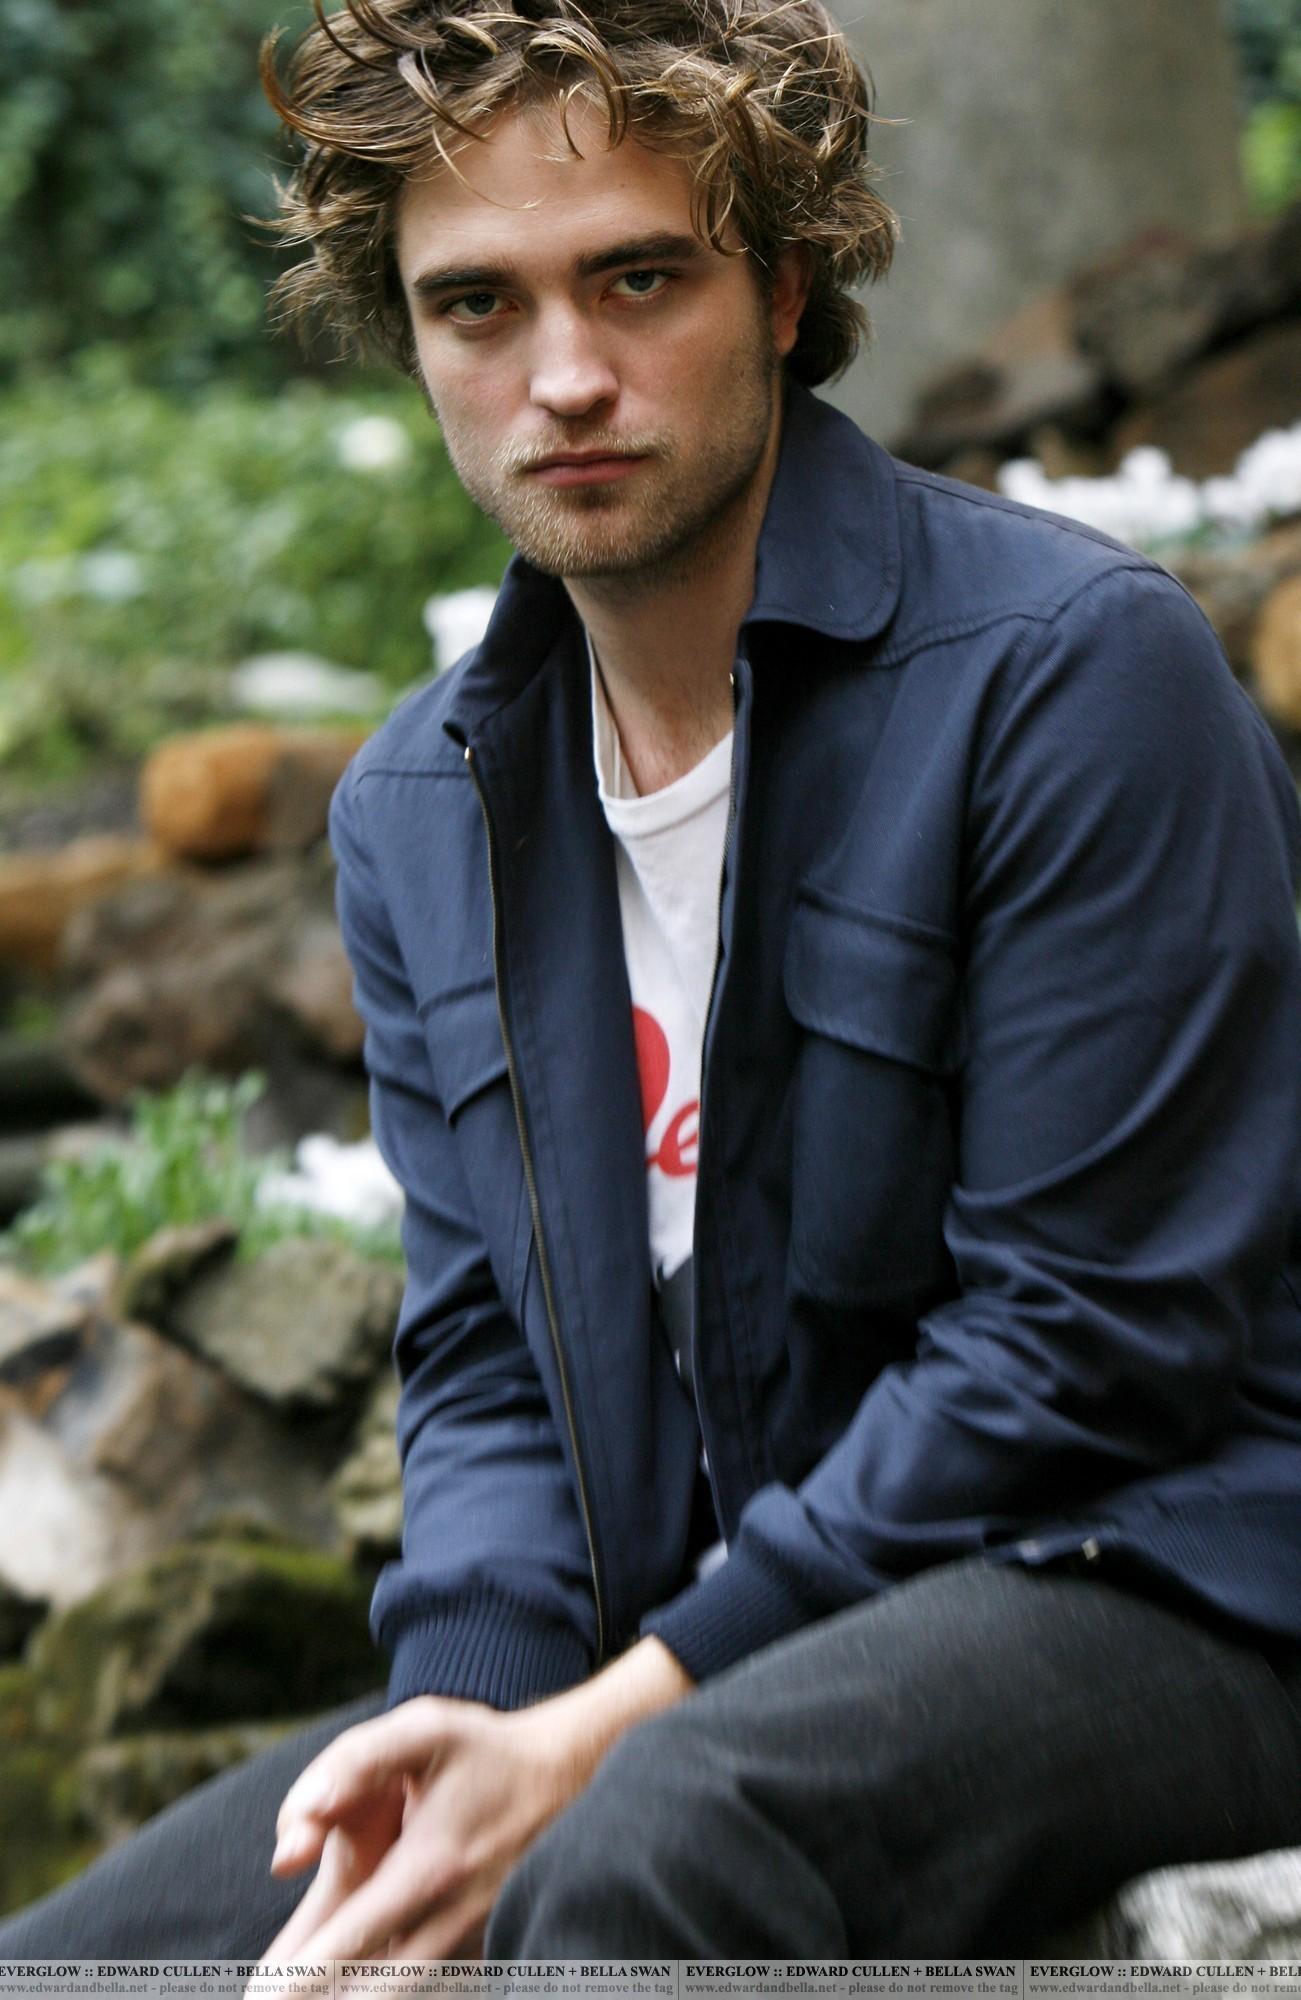 Edward Cullen Backgrounds (60+ images)